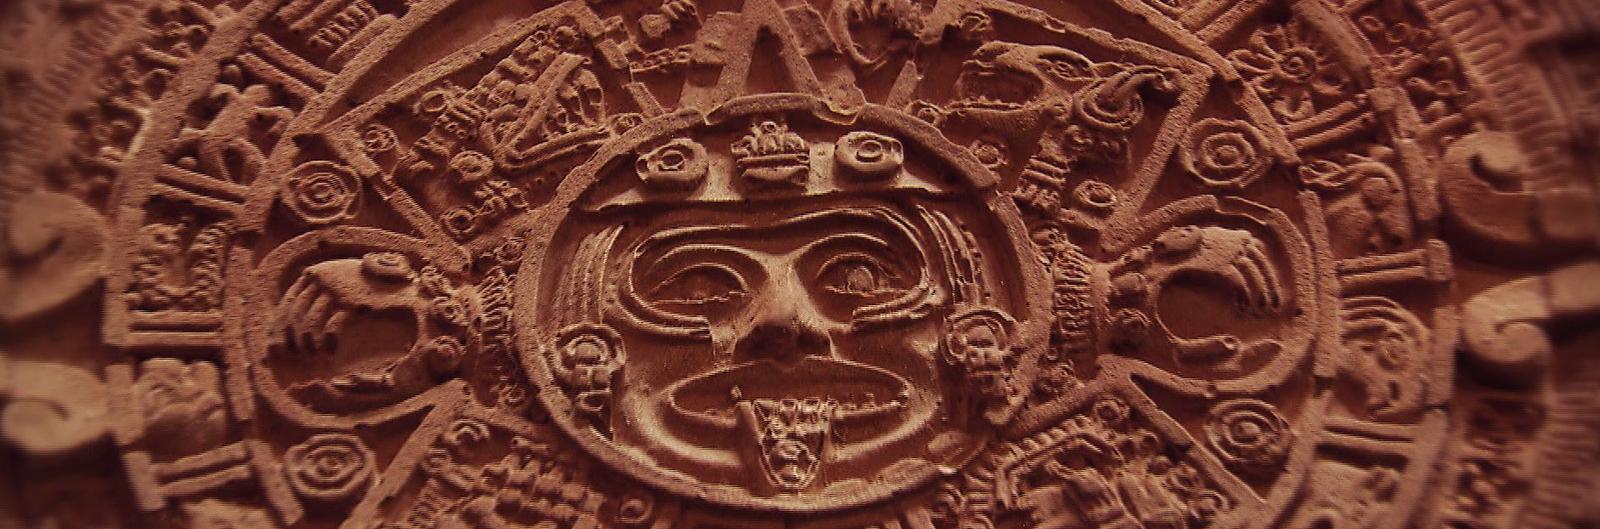 historic-cacao.jpg